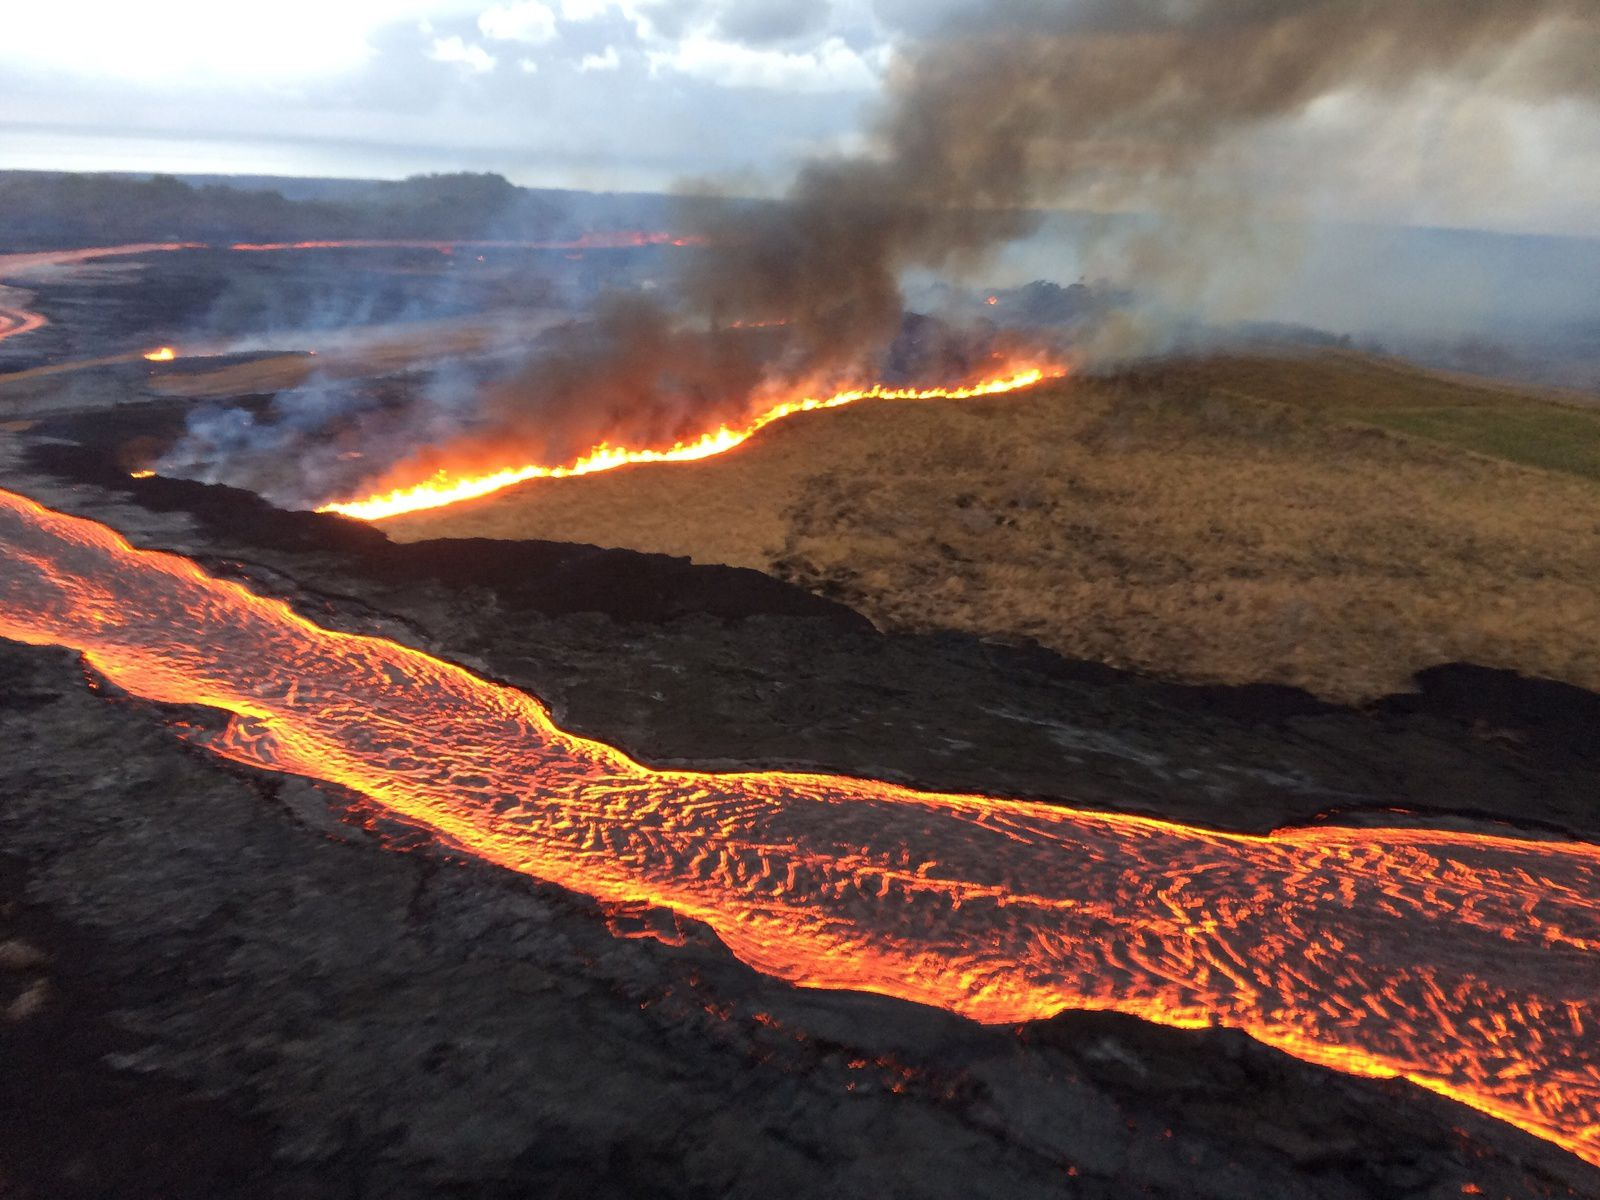 Kilauea East rift zone - fire on the spatter and cinder cone Halekamahina, generating dark smoke - photo 28.07.2018 USGS